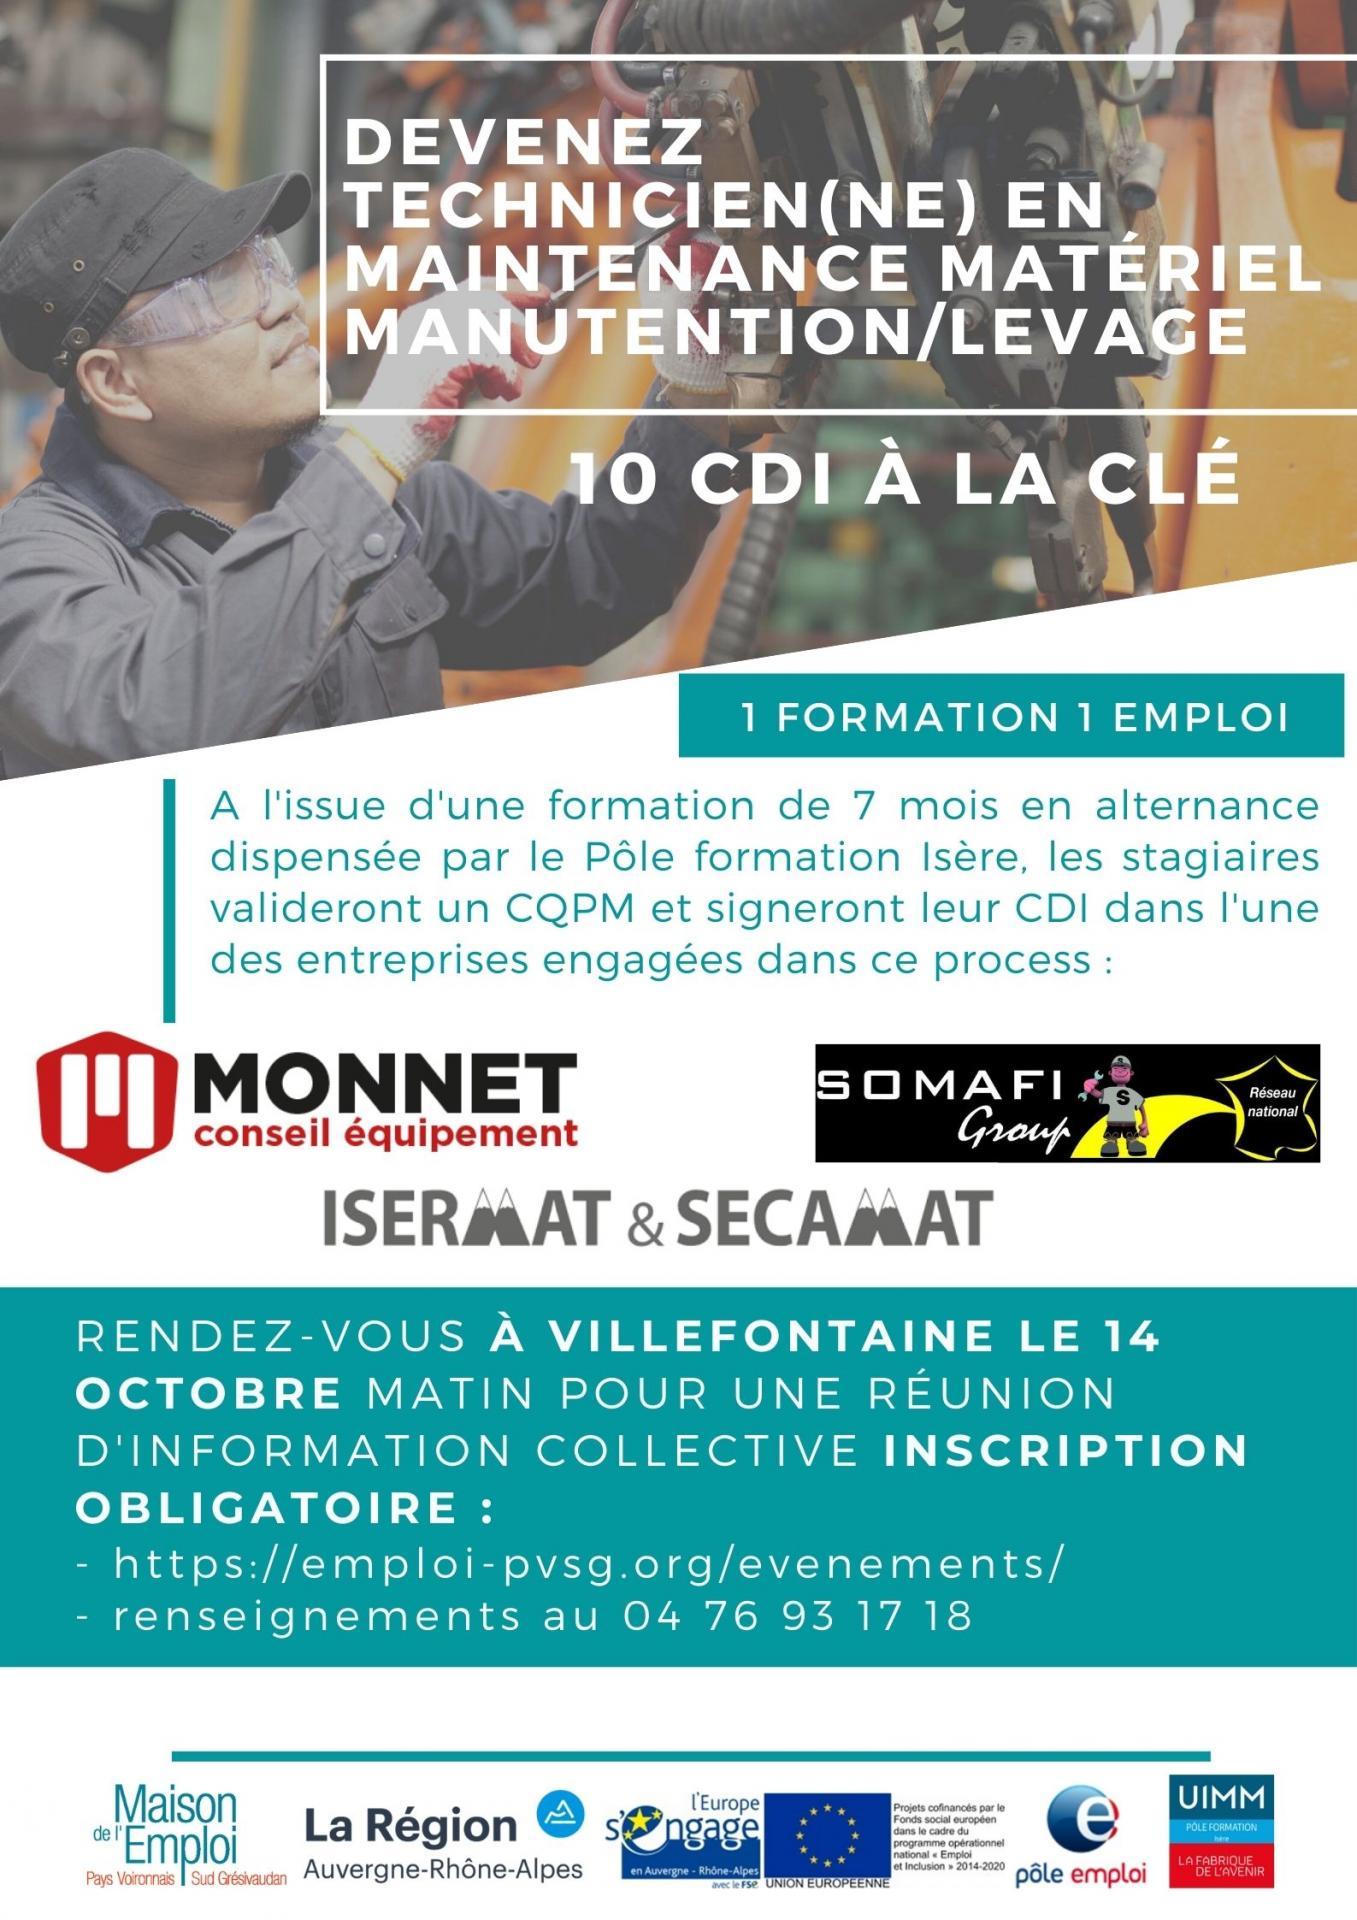 Affiche tech maintenance engin levagemanutention